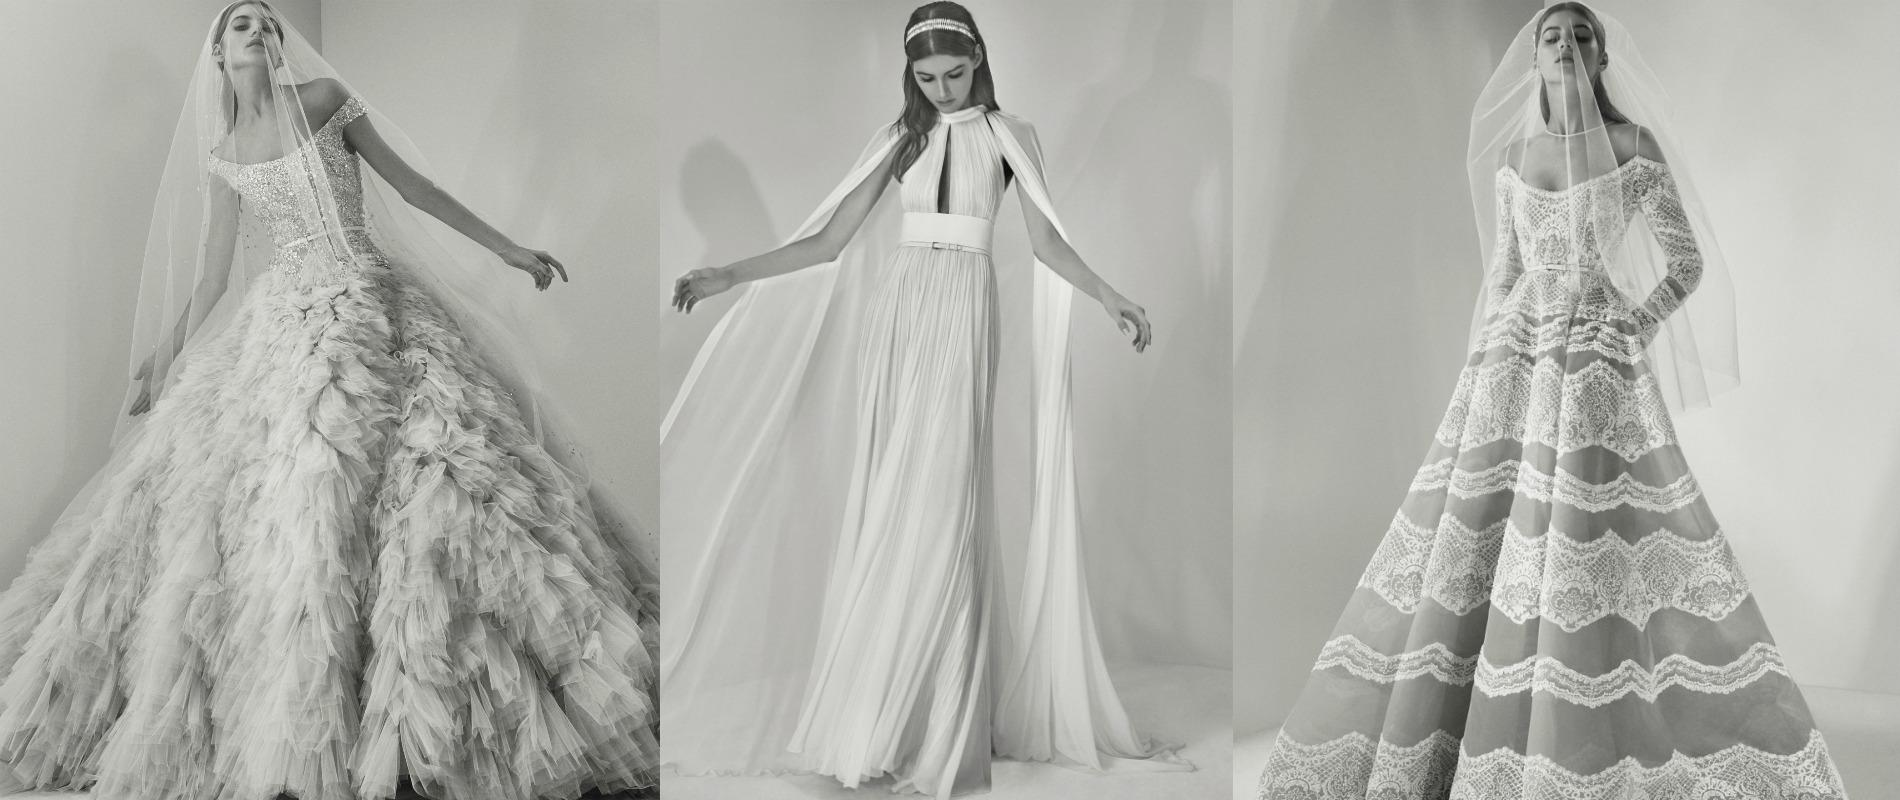 elie saab d voile ses nouvelles robes de mari e oniriques madame figaro. Black Bedroom Furniture Sets. Home Design Ideas